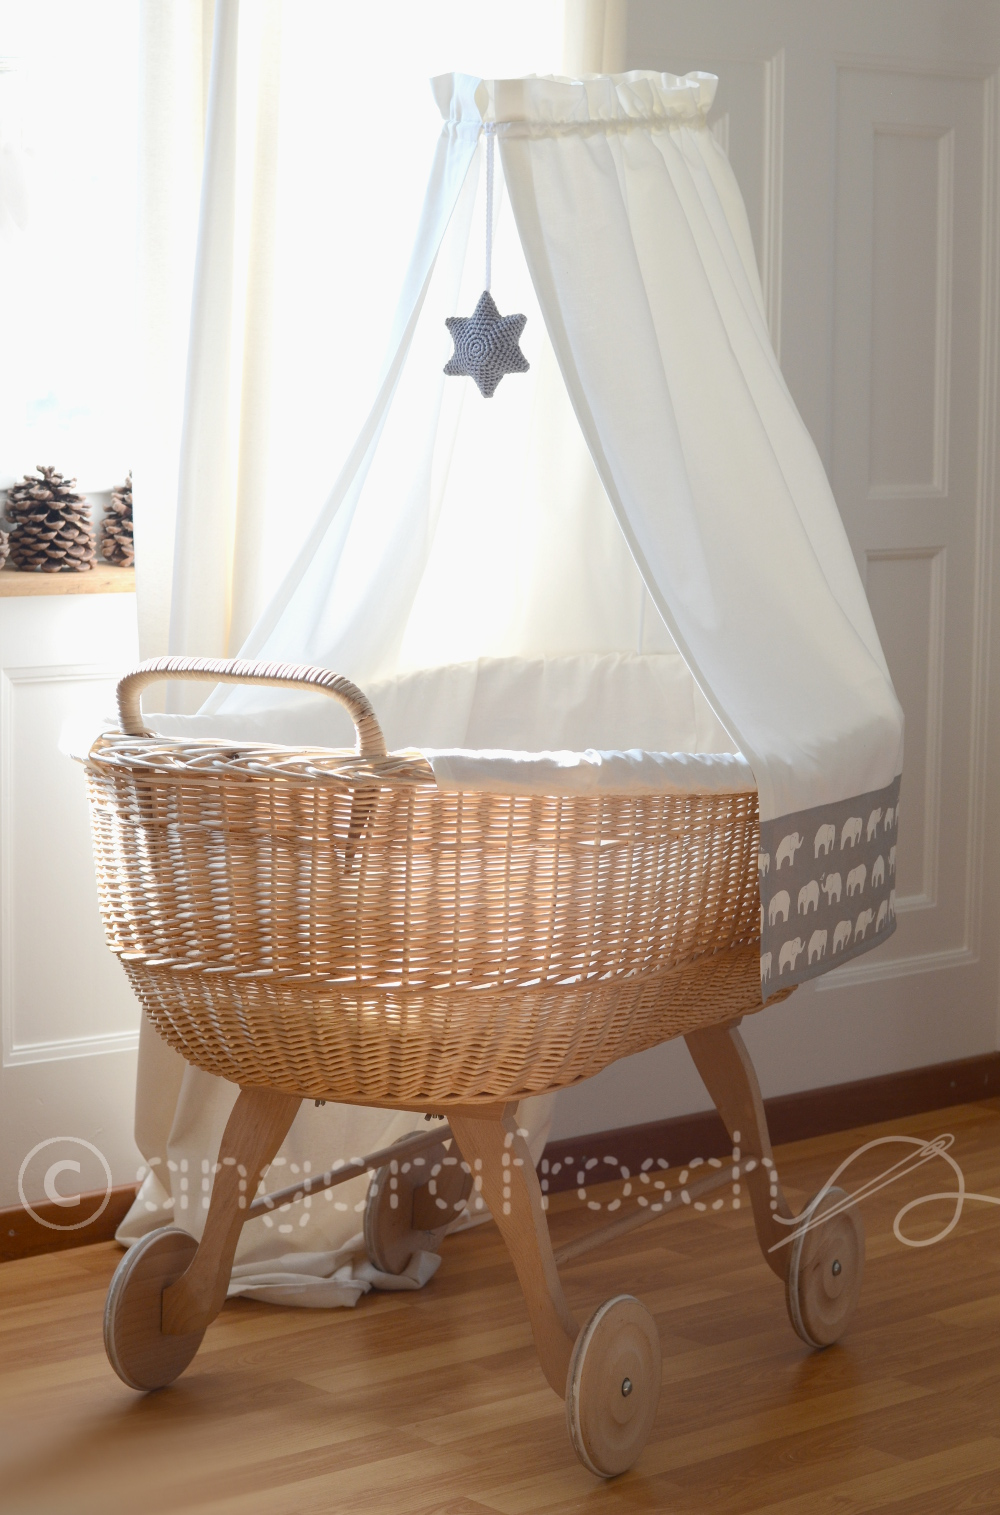 angorafrosch juni 2013. Black Bedroom Furniture Sets. Home Design Ideas